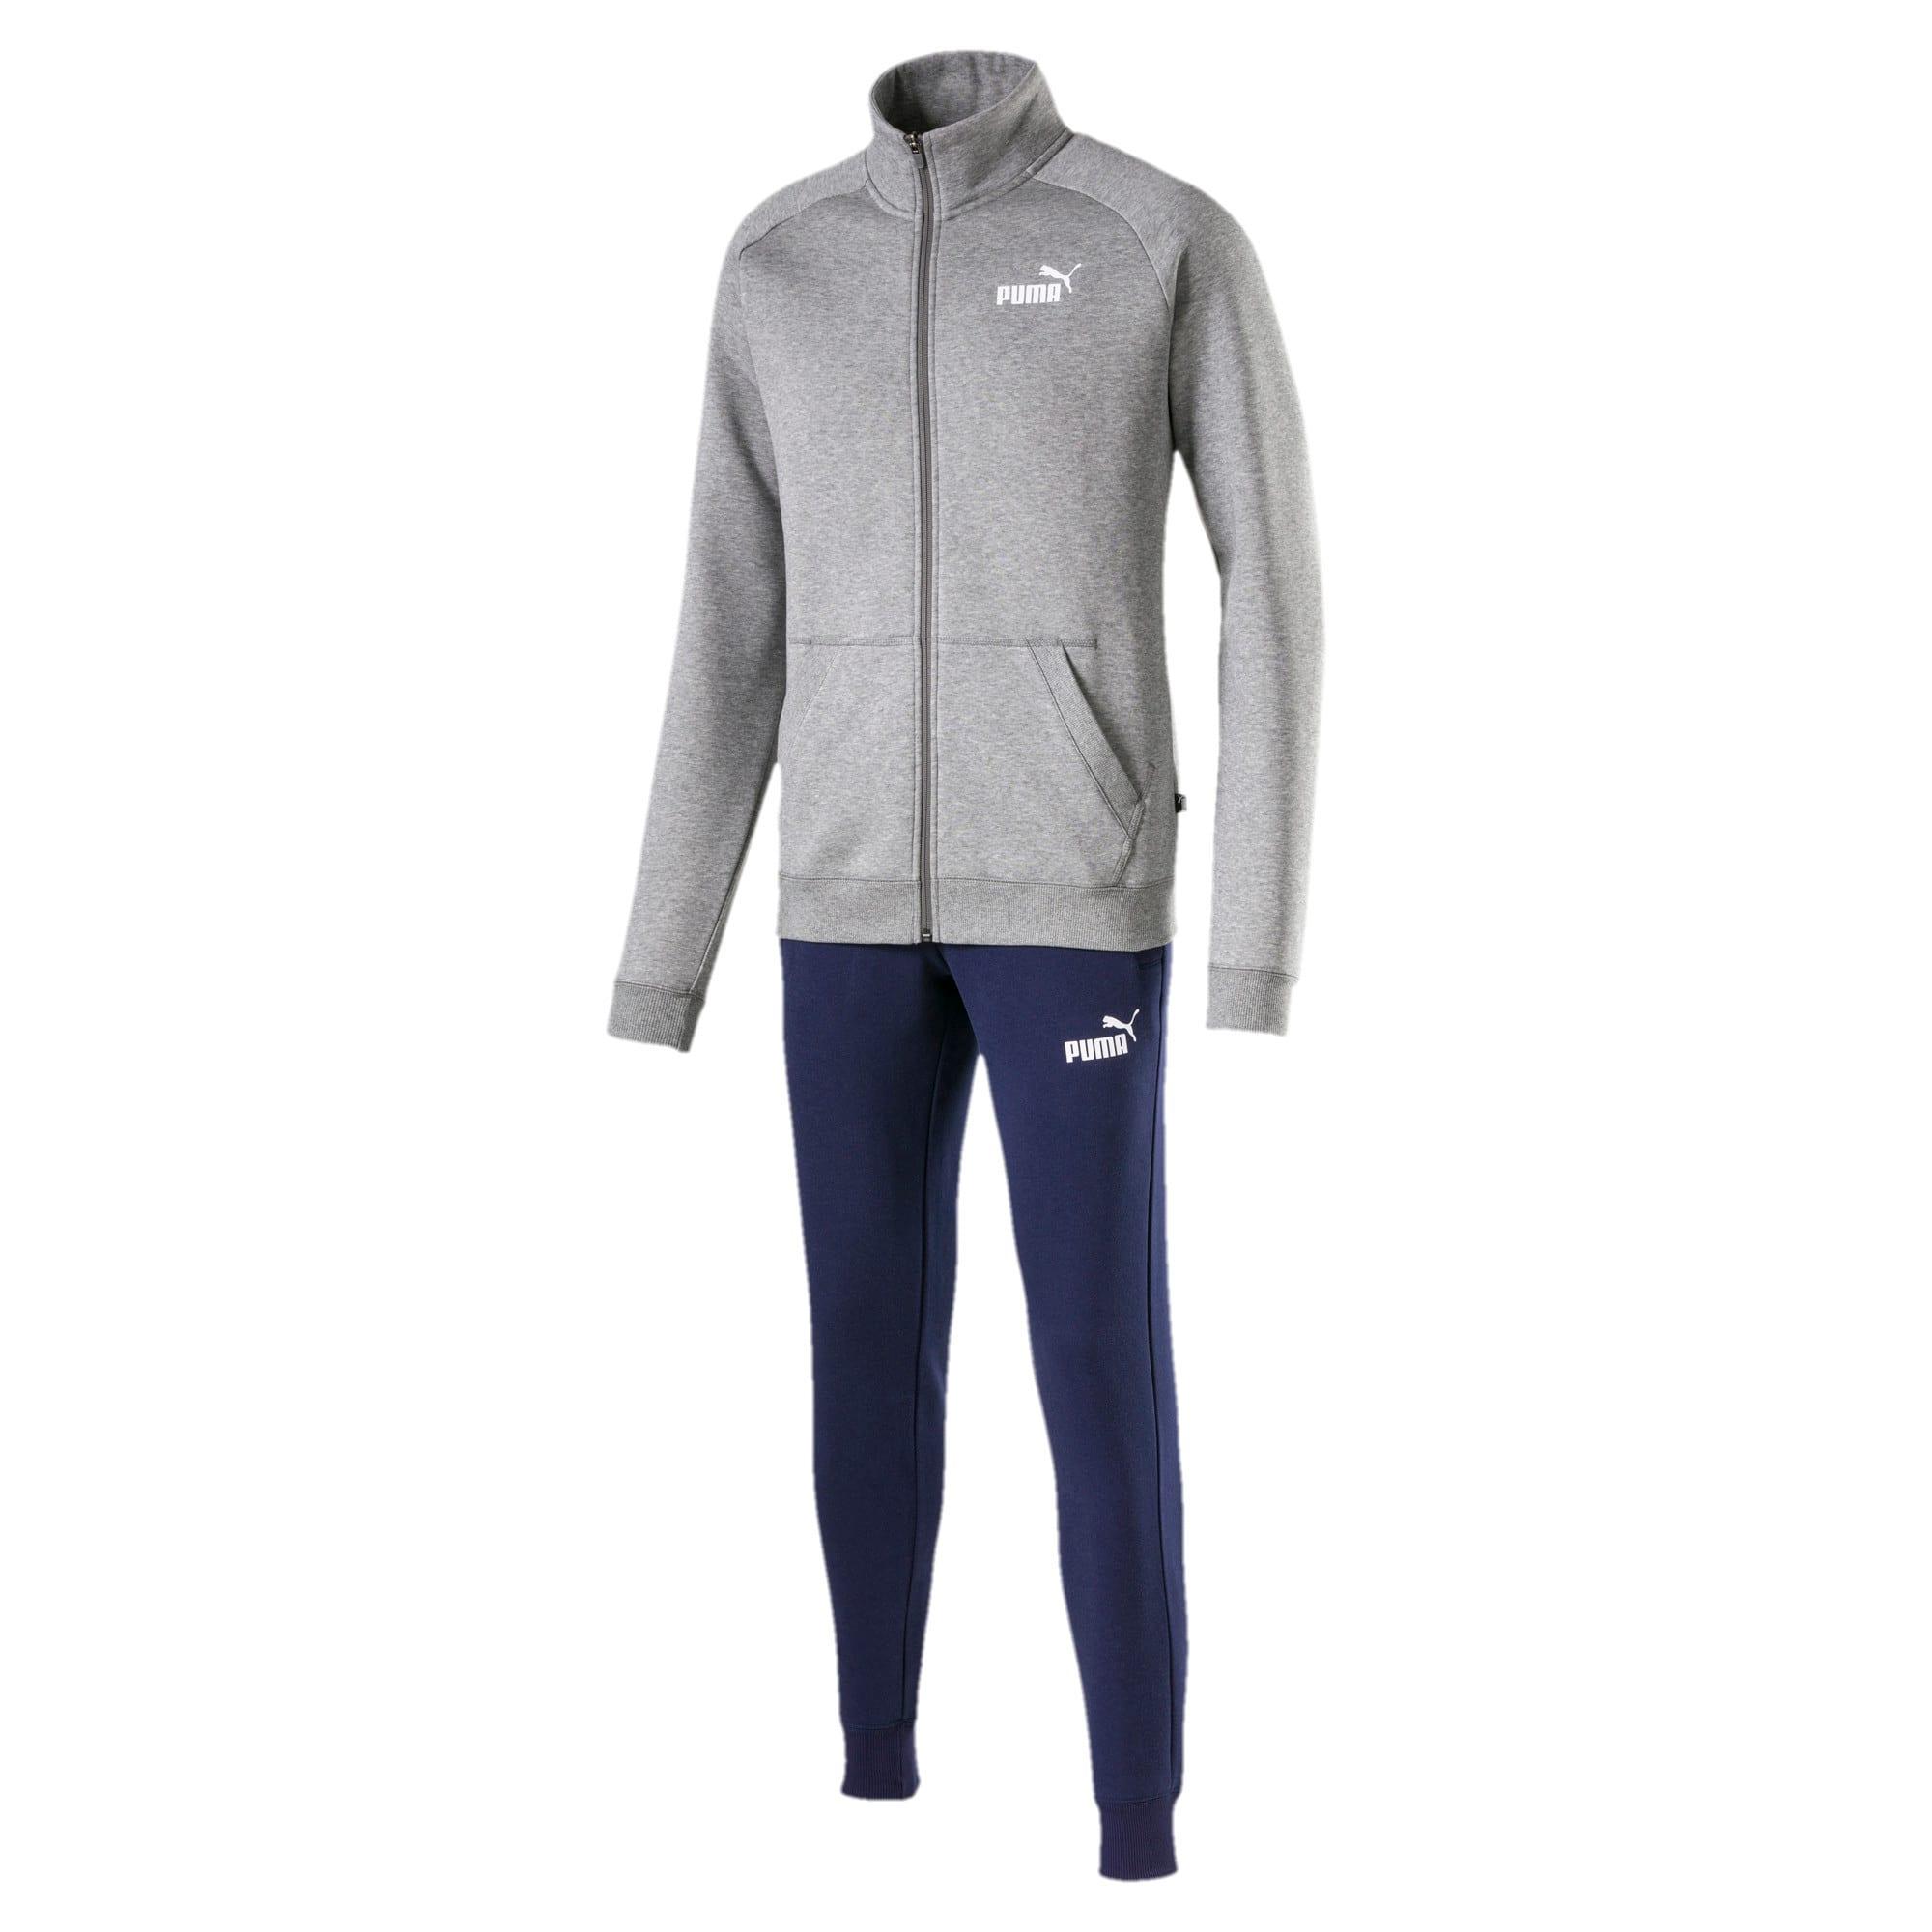 Thumbnail 3 of Clean CL Men's Sweat Suit, Medium Gray Heather, medium-IND